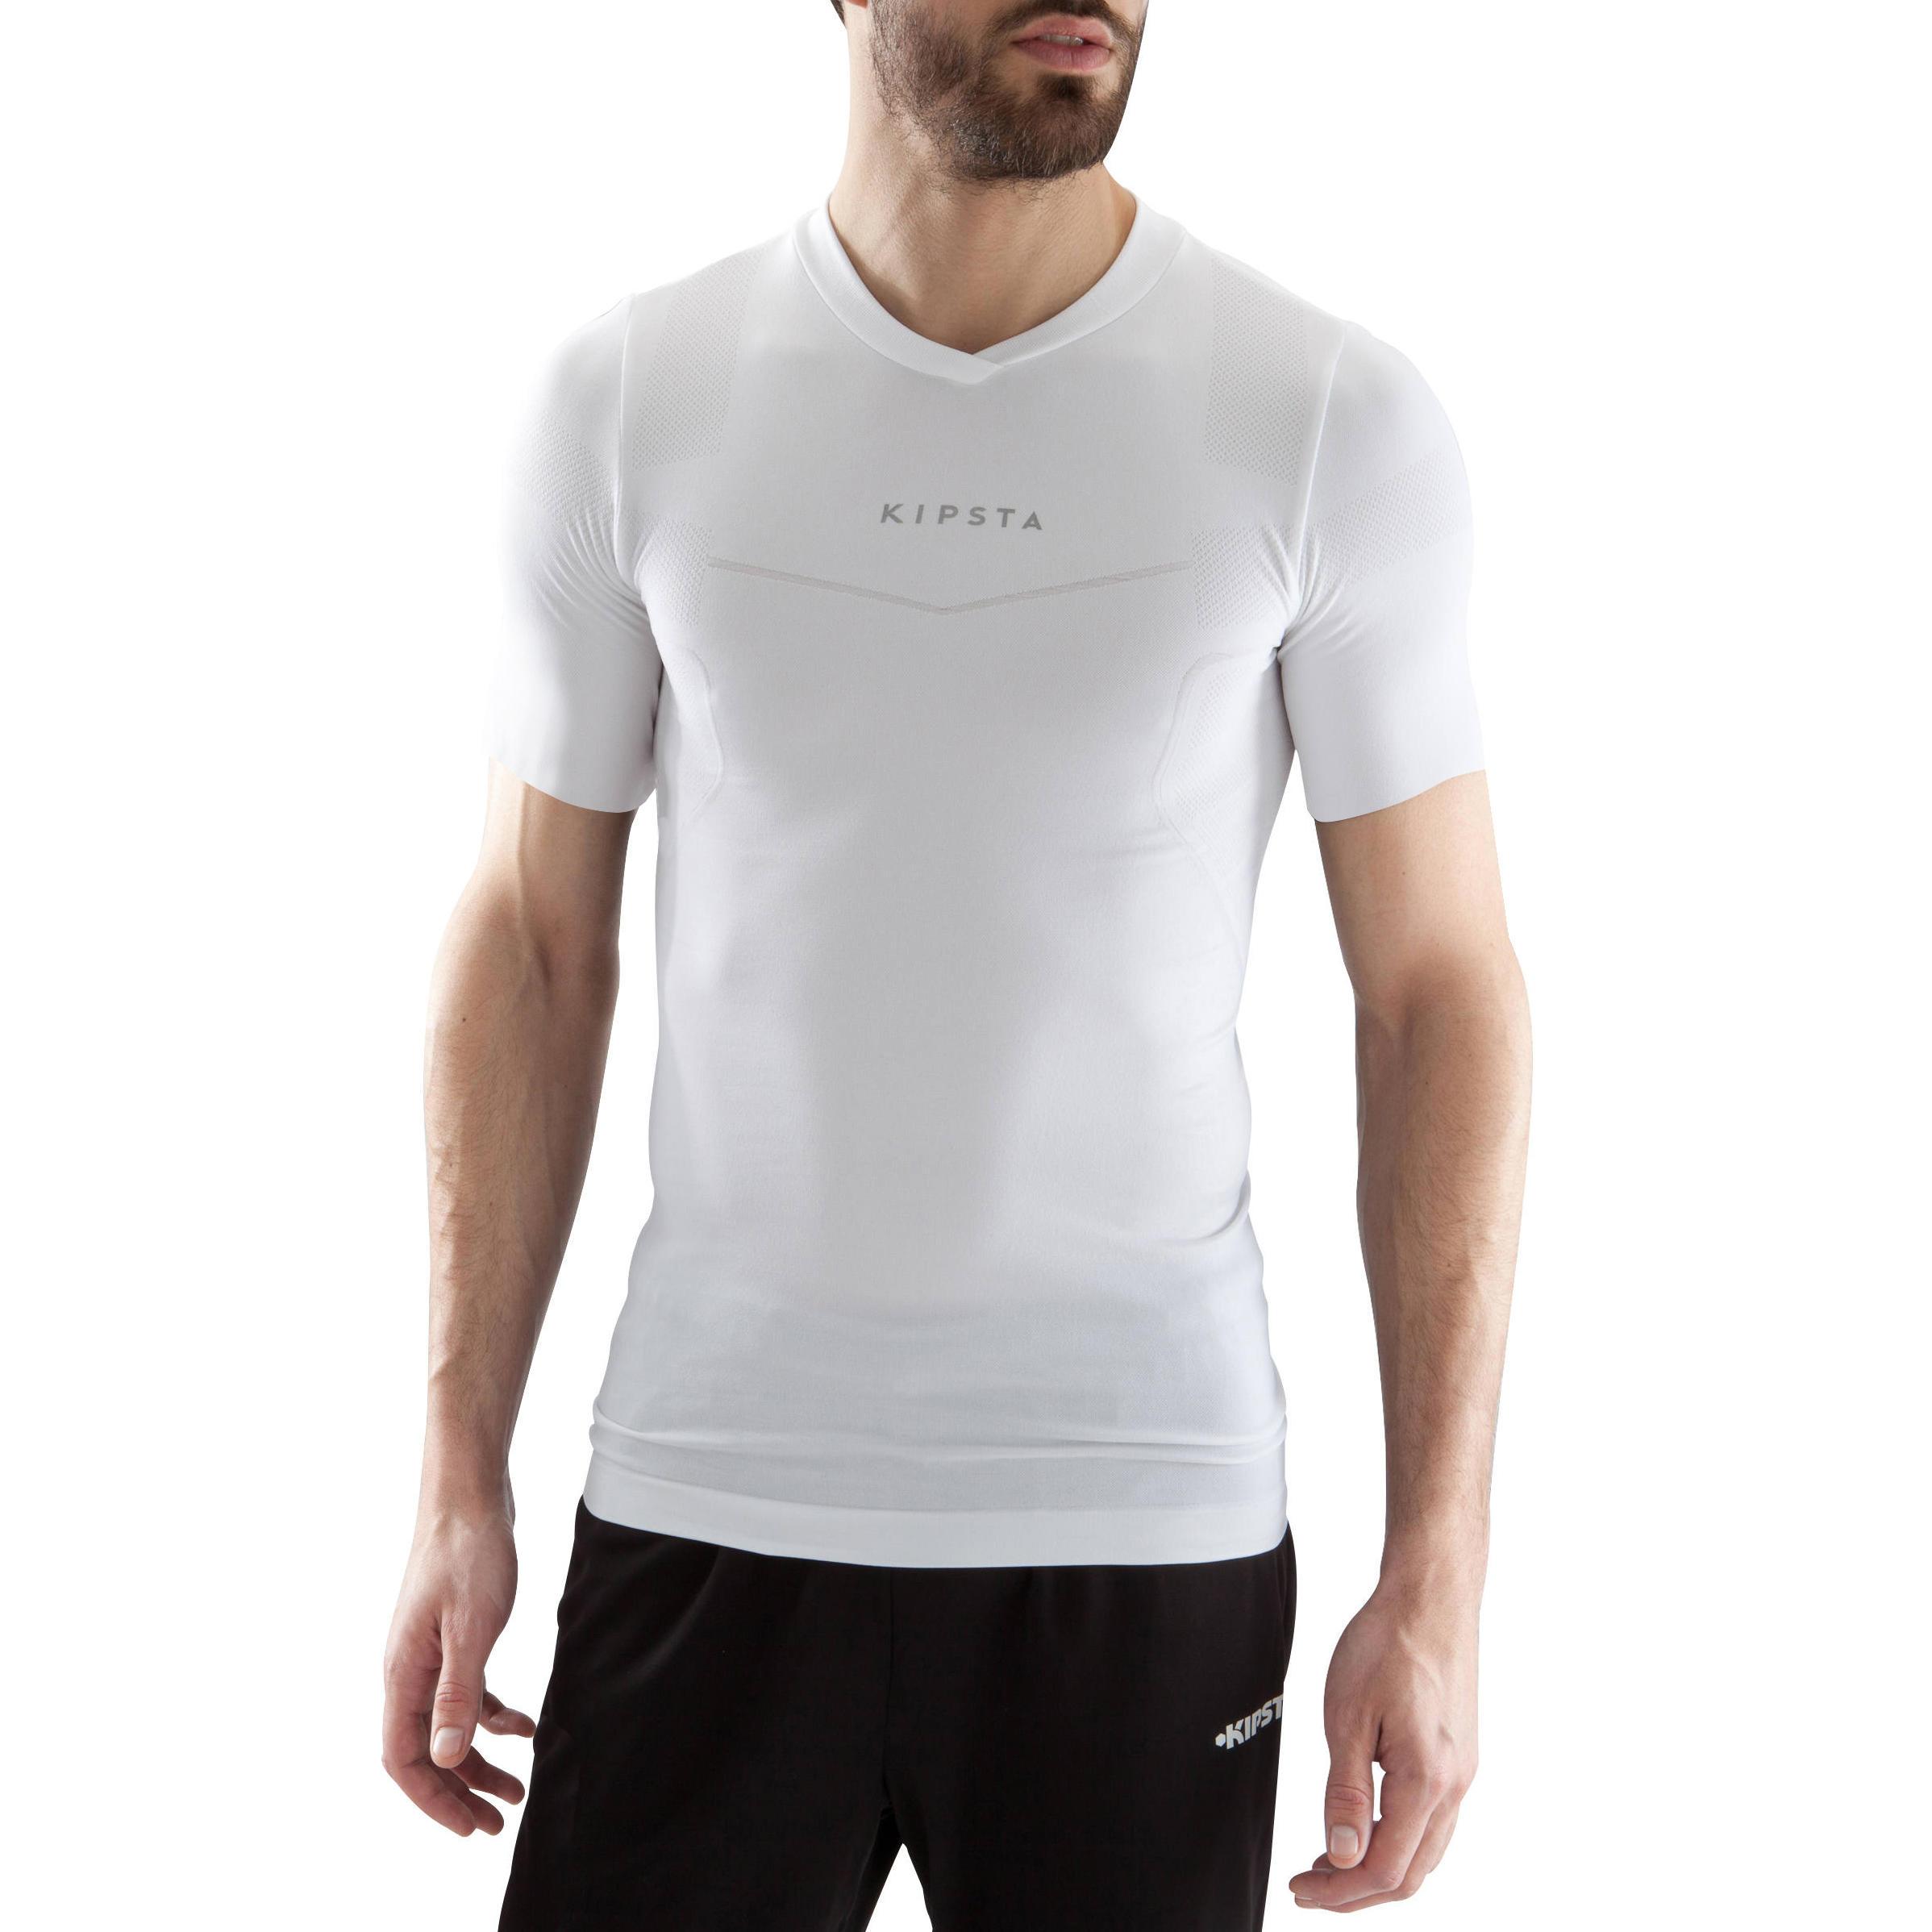 Sous maillot respirant manches courtes adulte Respirant 500 blanc